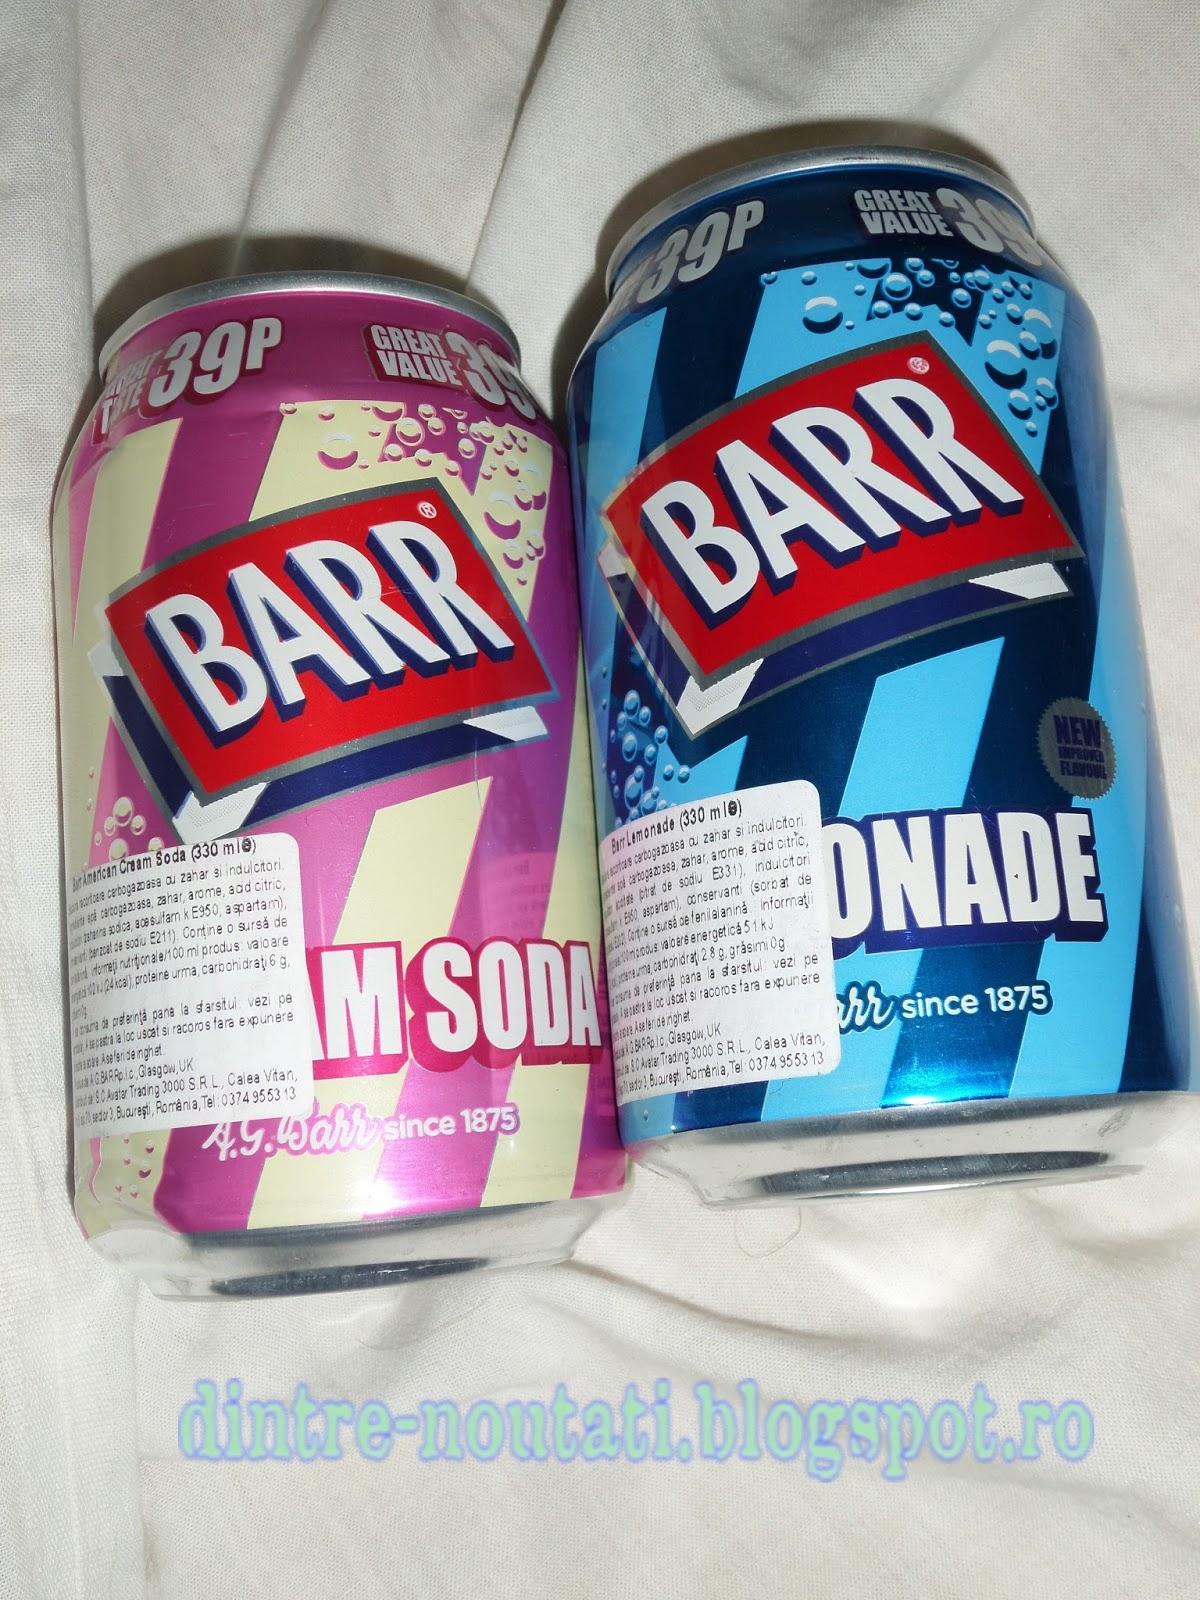 BARR AMERICAN !CECREAM SODA Bautura racoritoare cu zahar si indulcitori aroma de inghetata